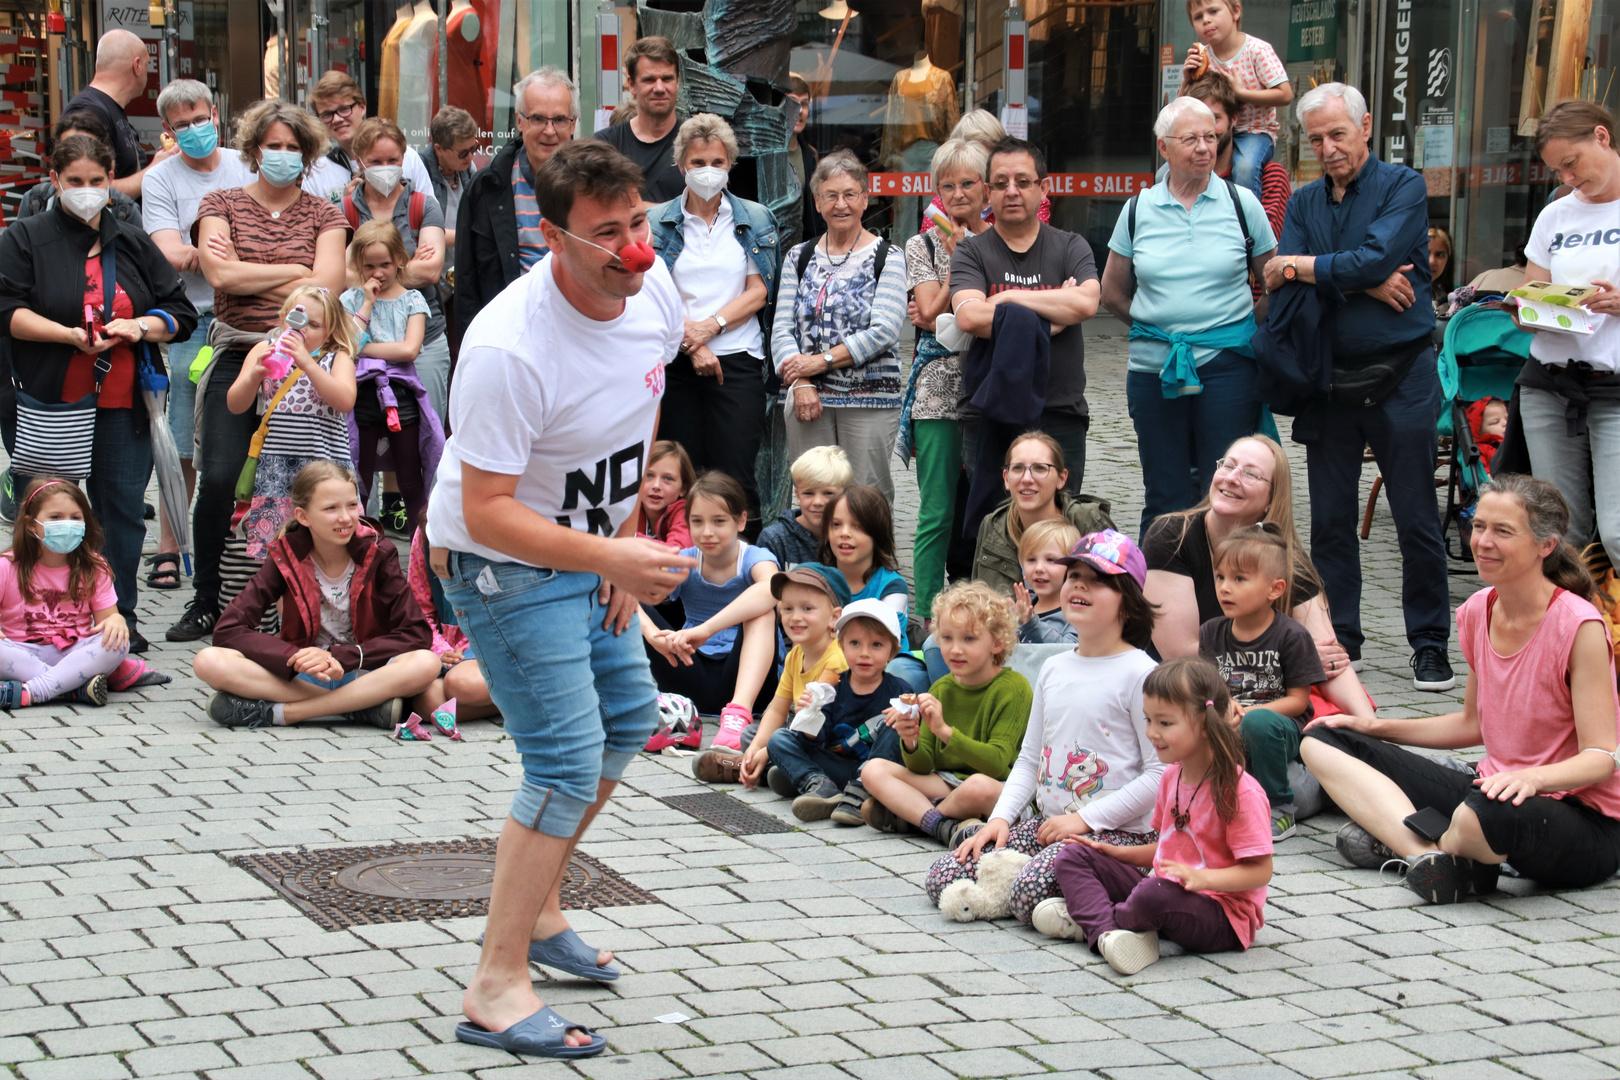 street Clown c21-2076-col +Fotos